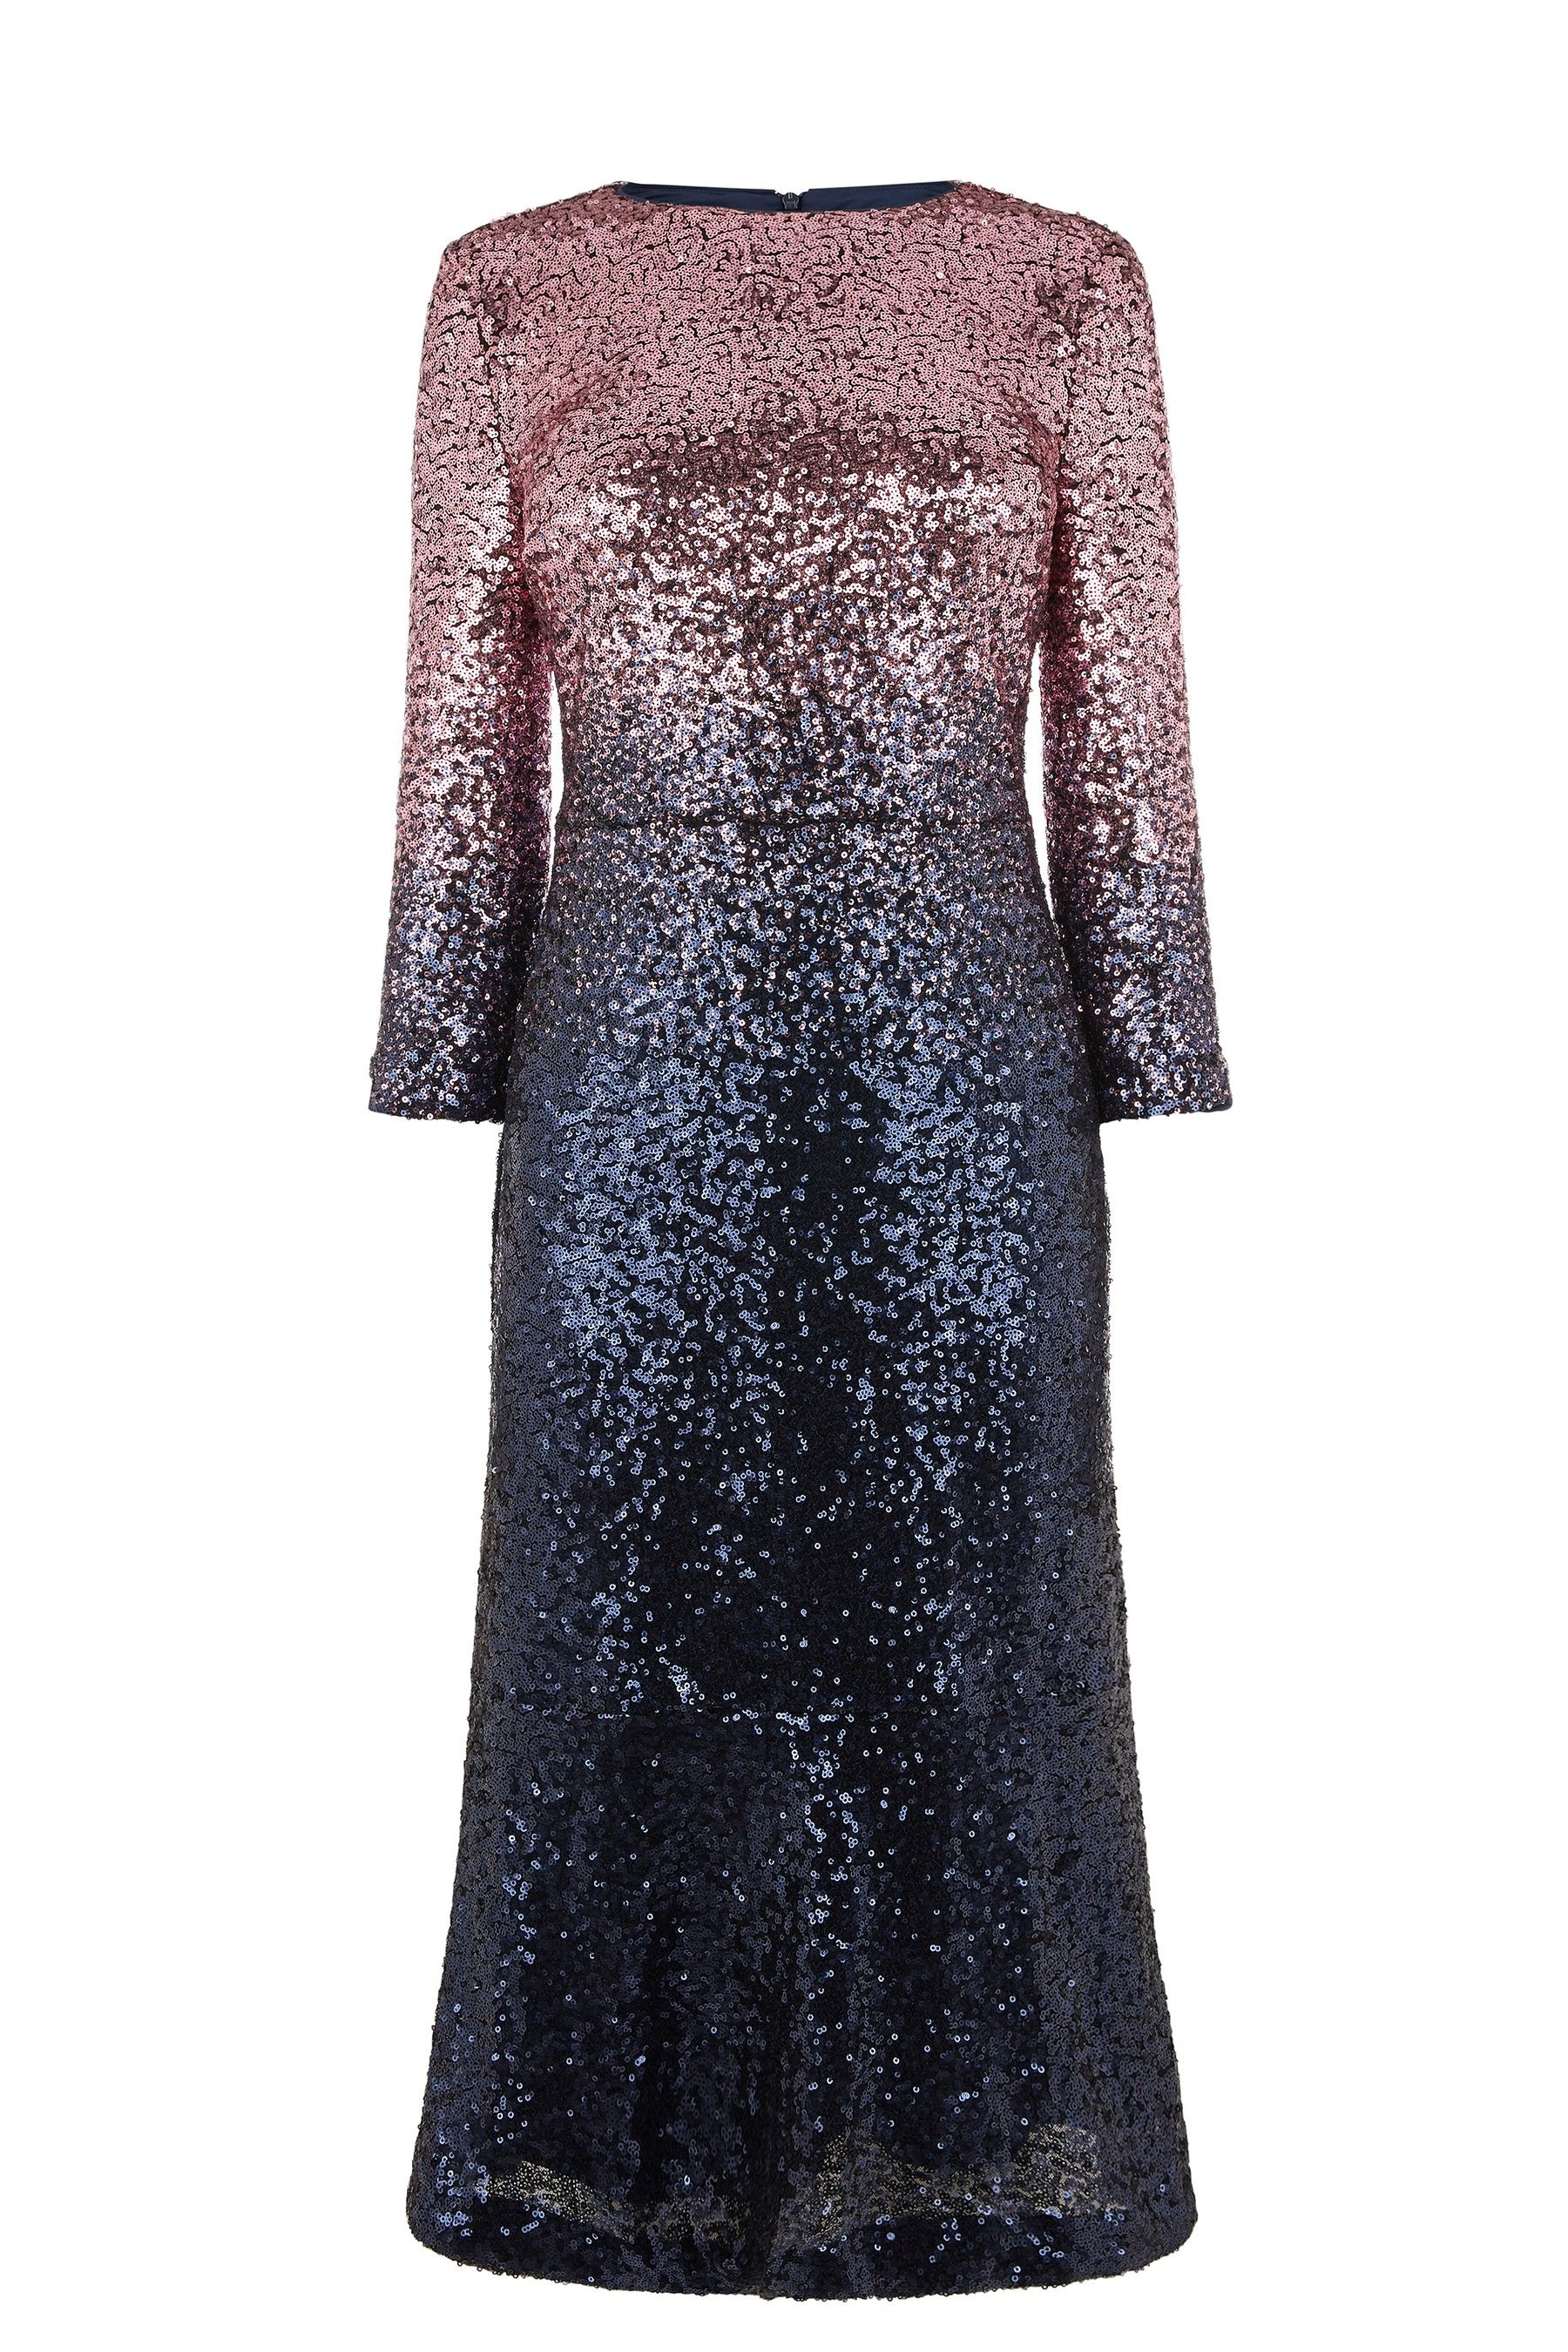 93a8c662 Womens Oasis Purple Ombre Sequin Midi Dress - Purple | Products ...